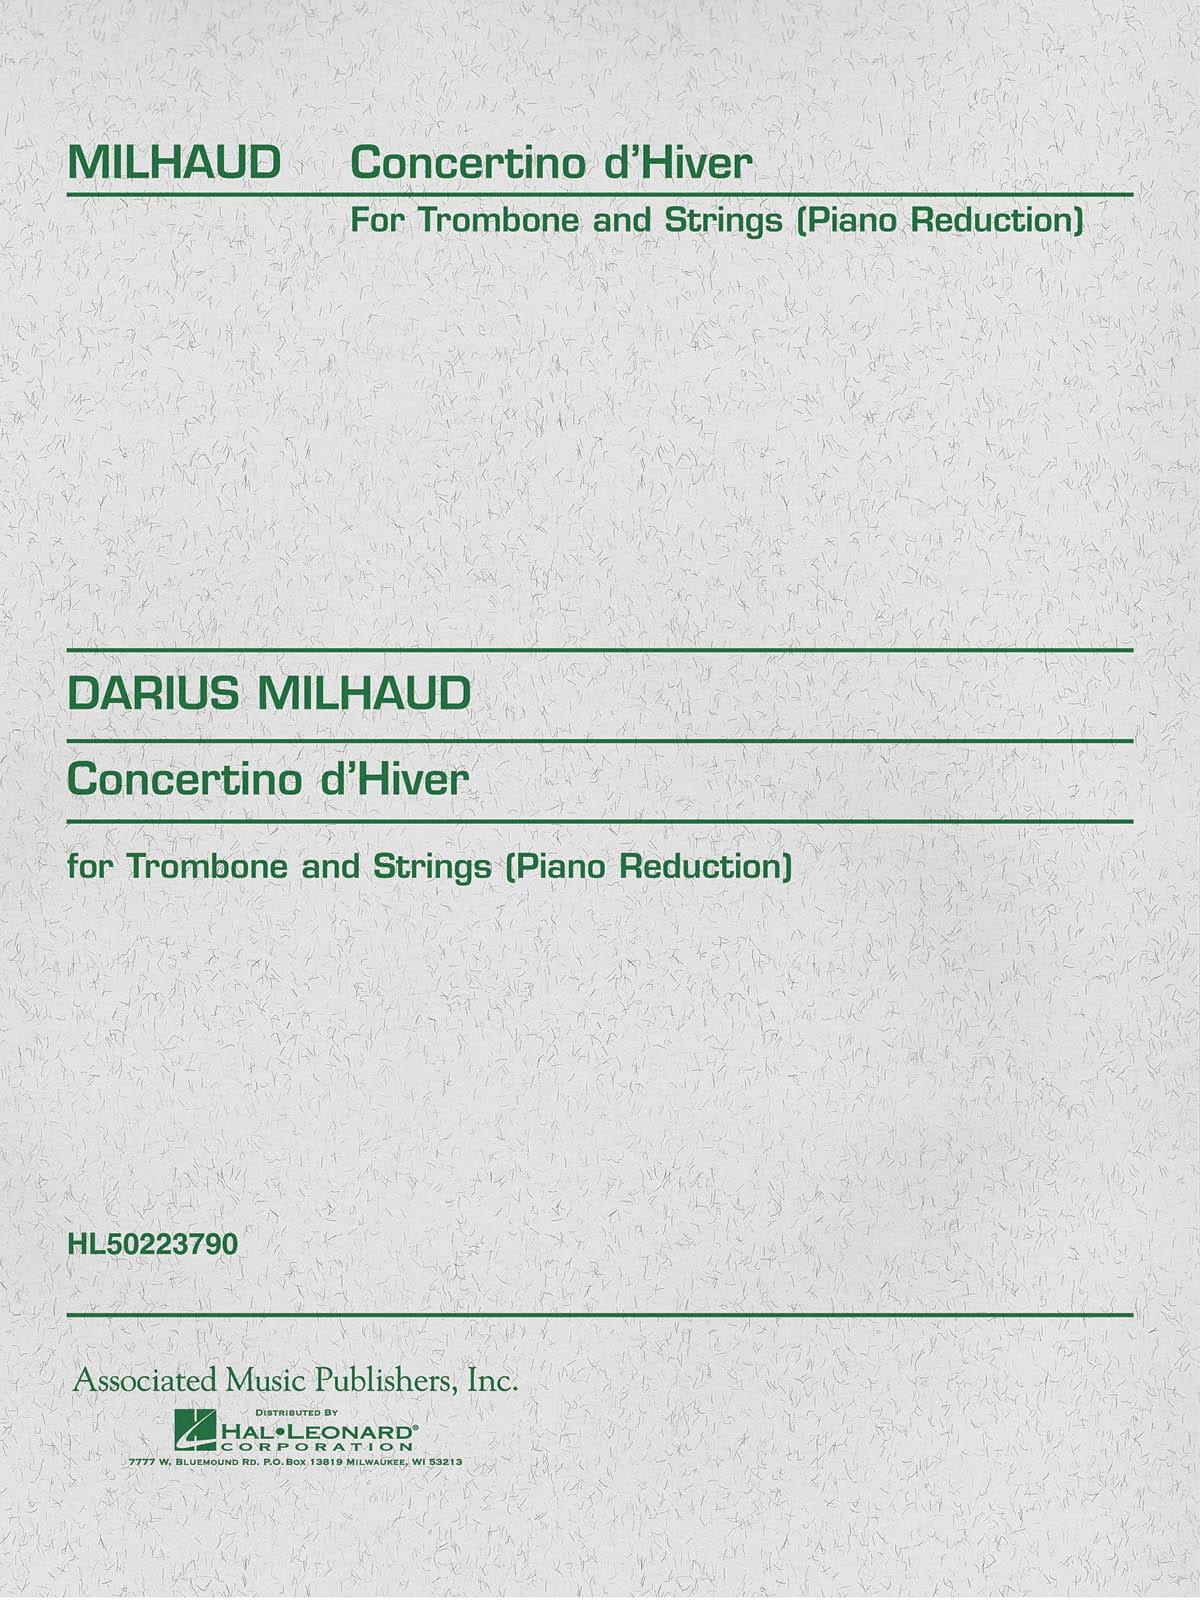 Concertino D' Hiver - MILHAUD - Partition - laflutedepan.com